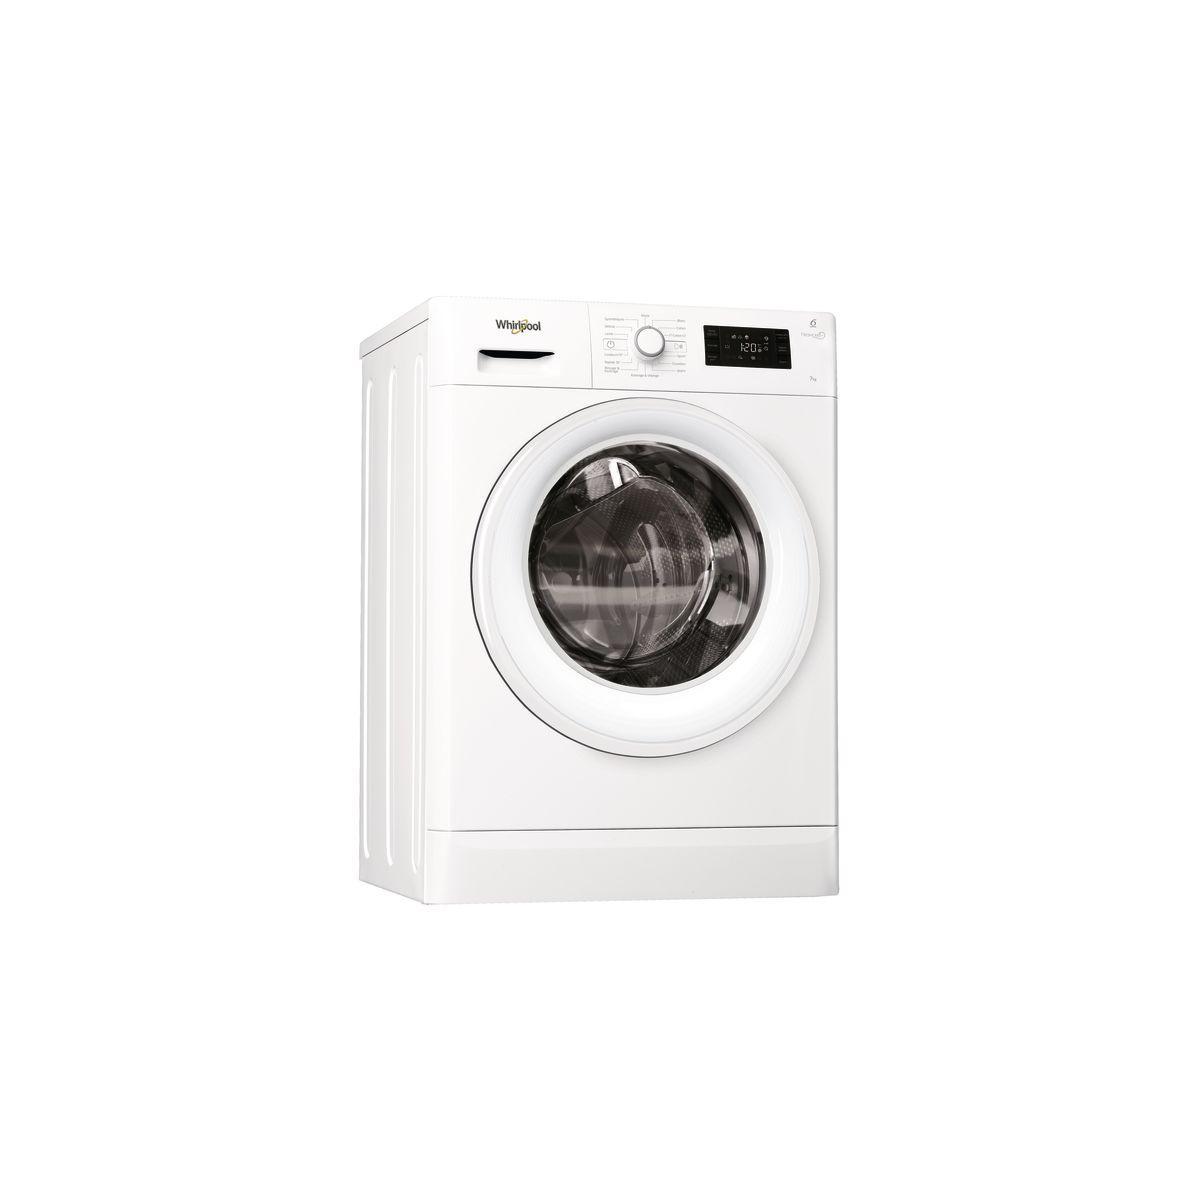 Lave linge compact WHIRLPOOL Freshcare FWSG71253WFR